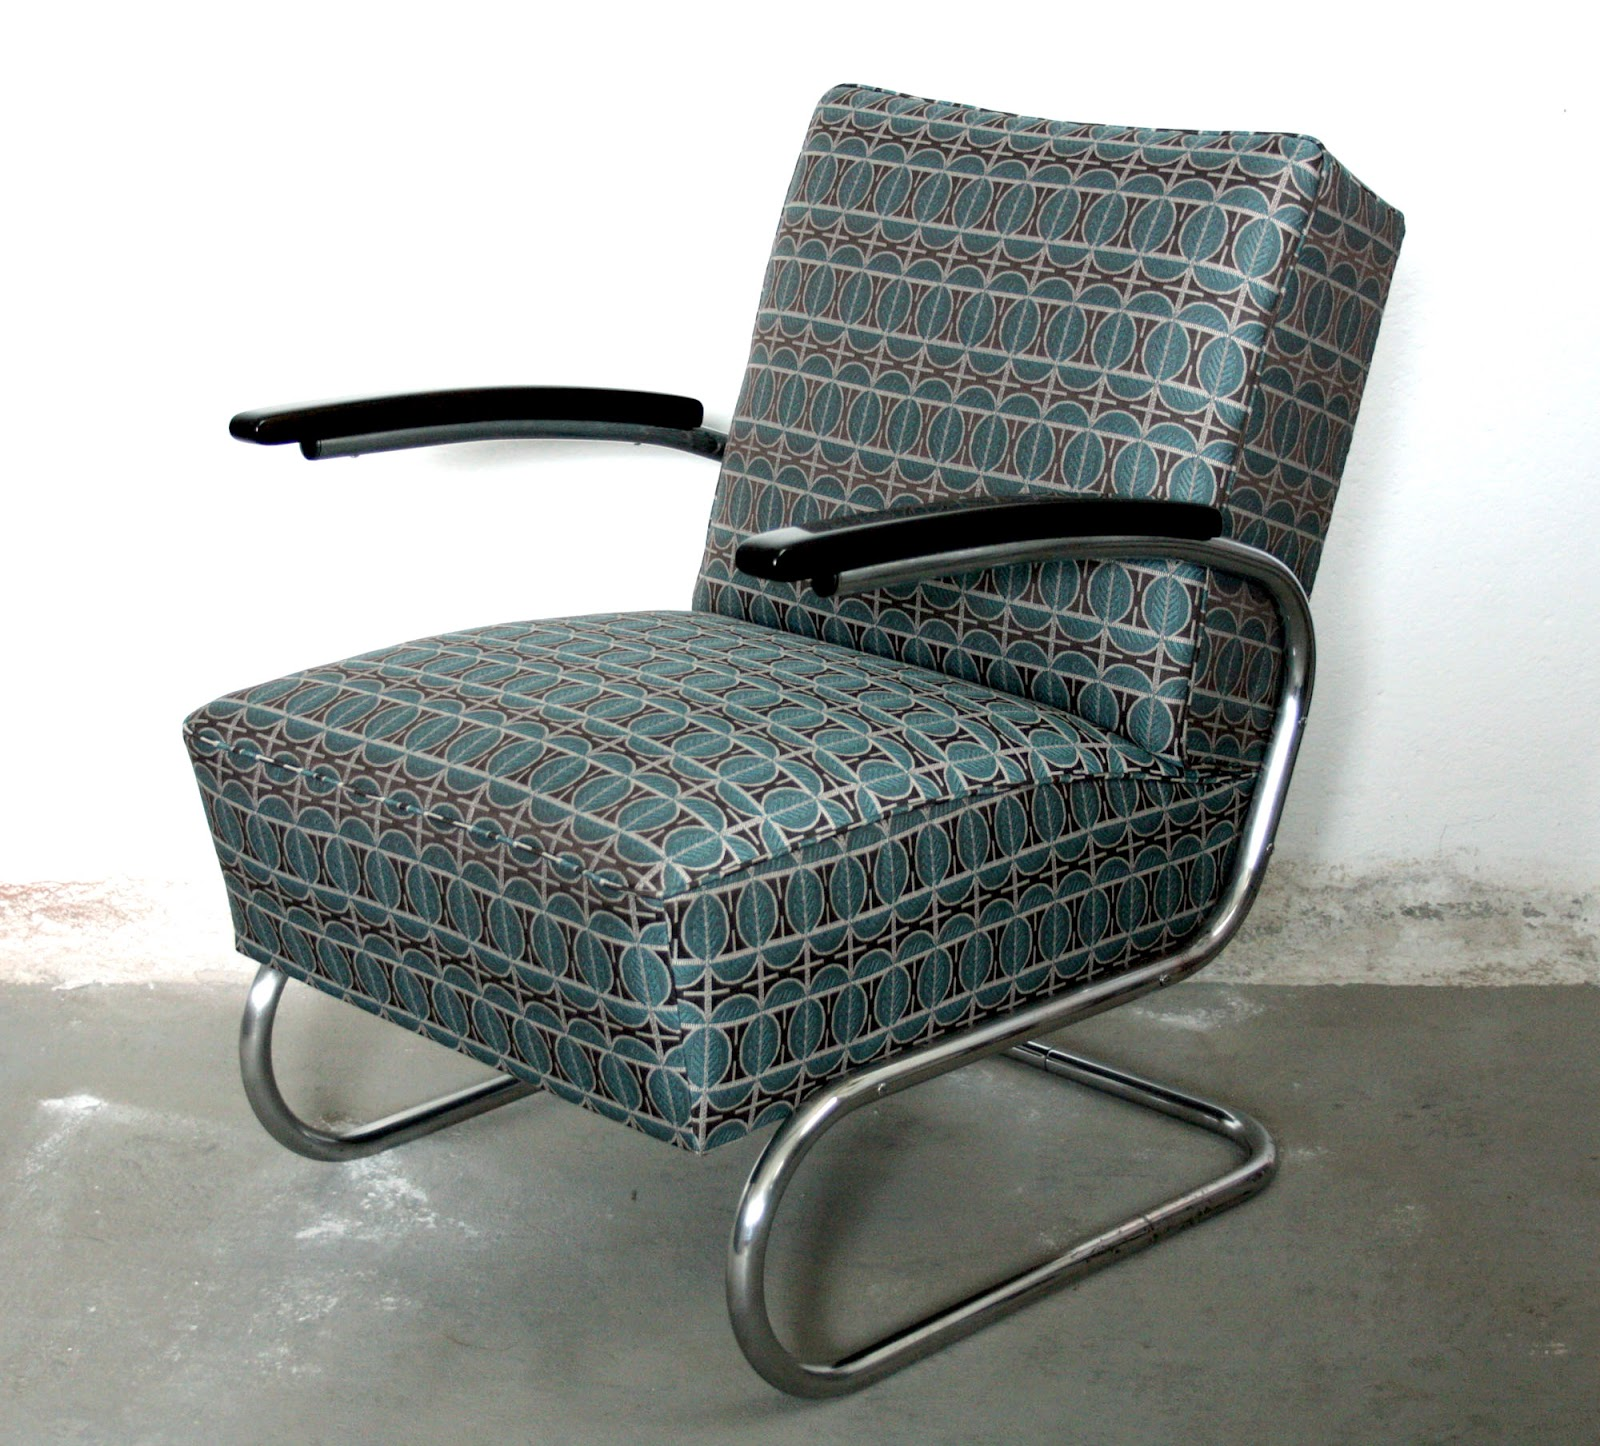 funkcionalistick k eslo thonet. Black Bedroom Furniture Sets. Home Design Ideas